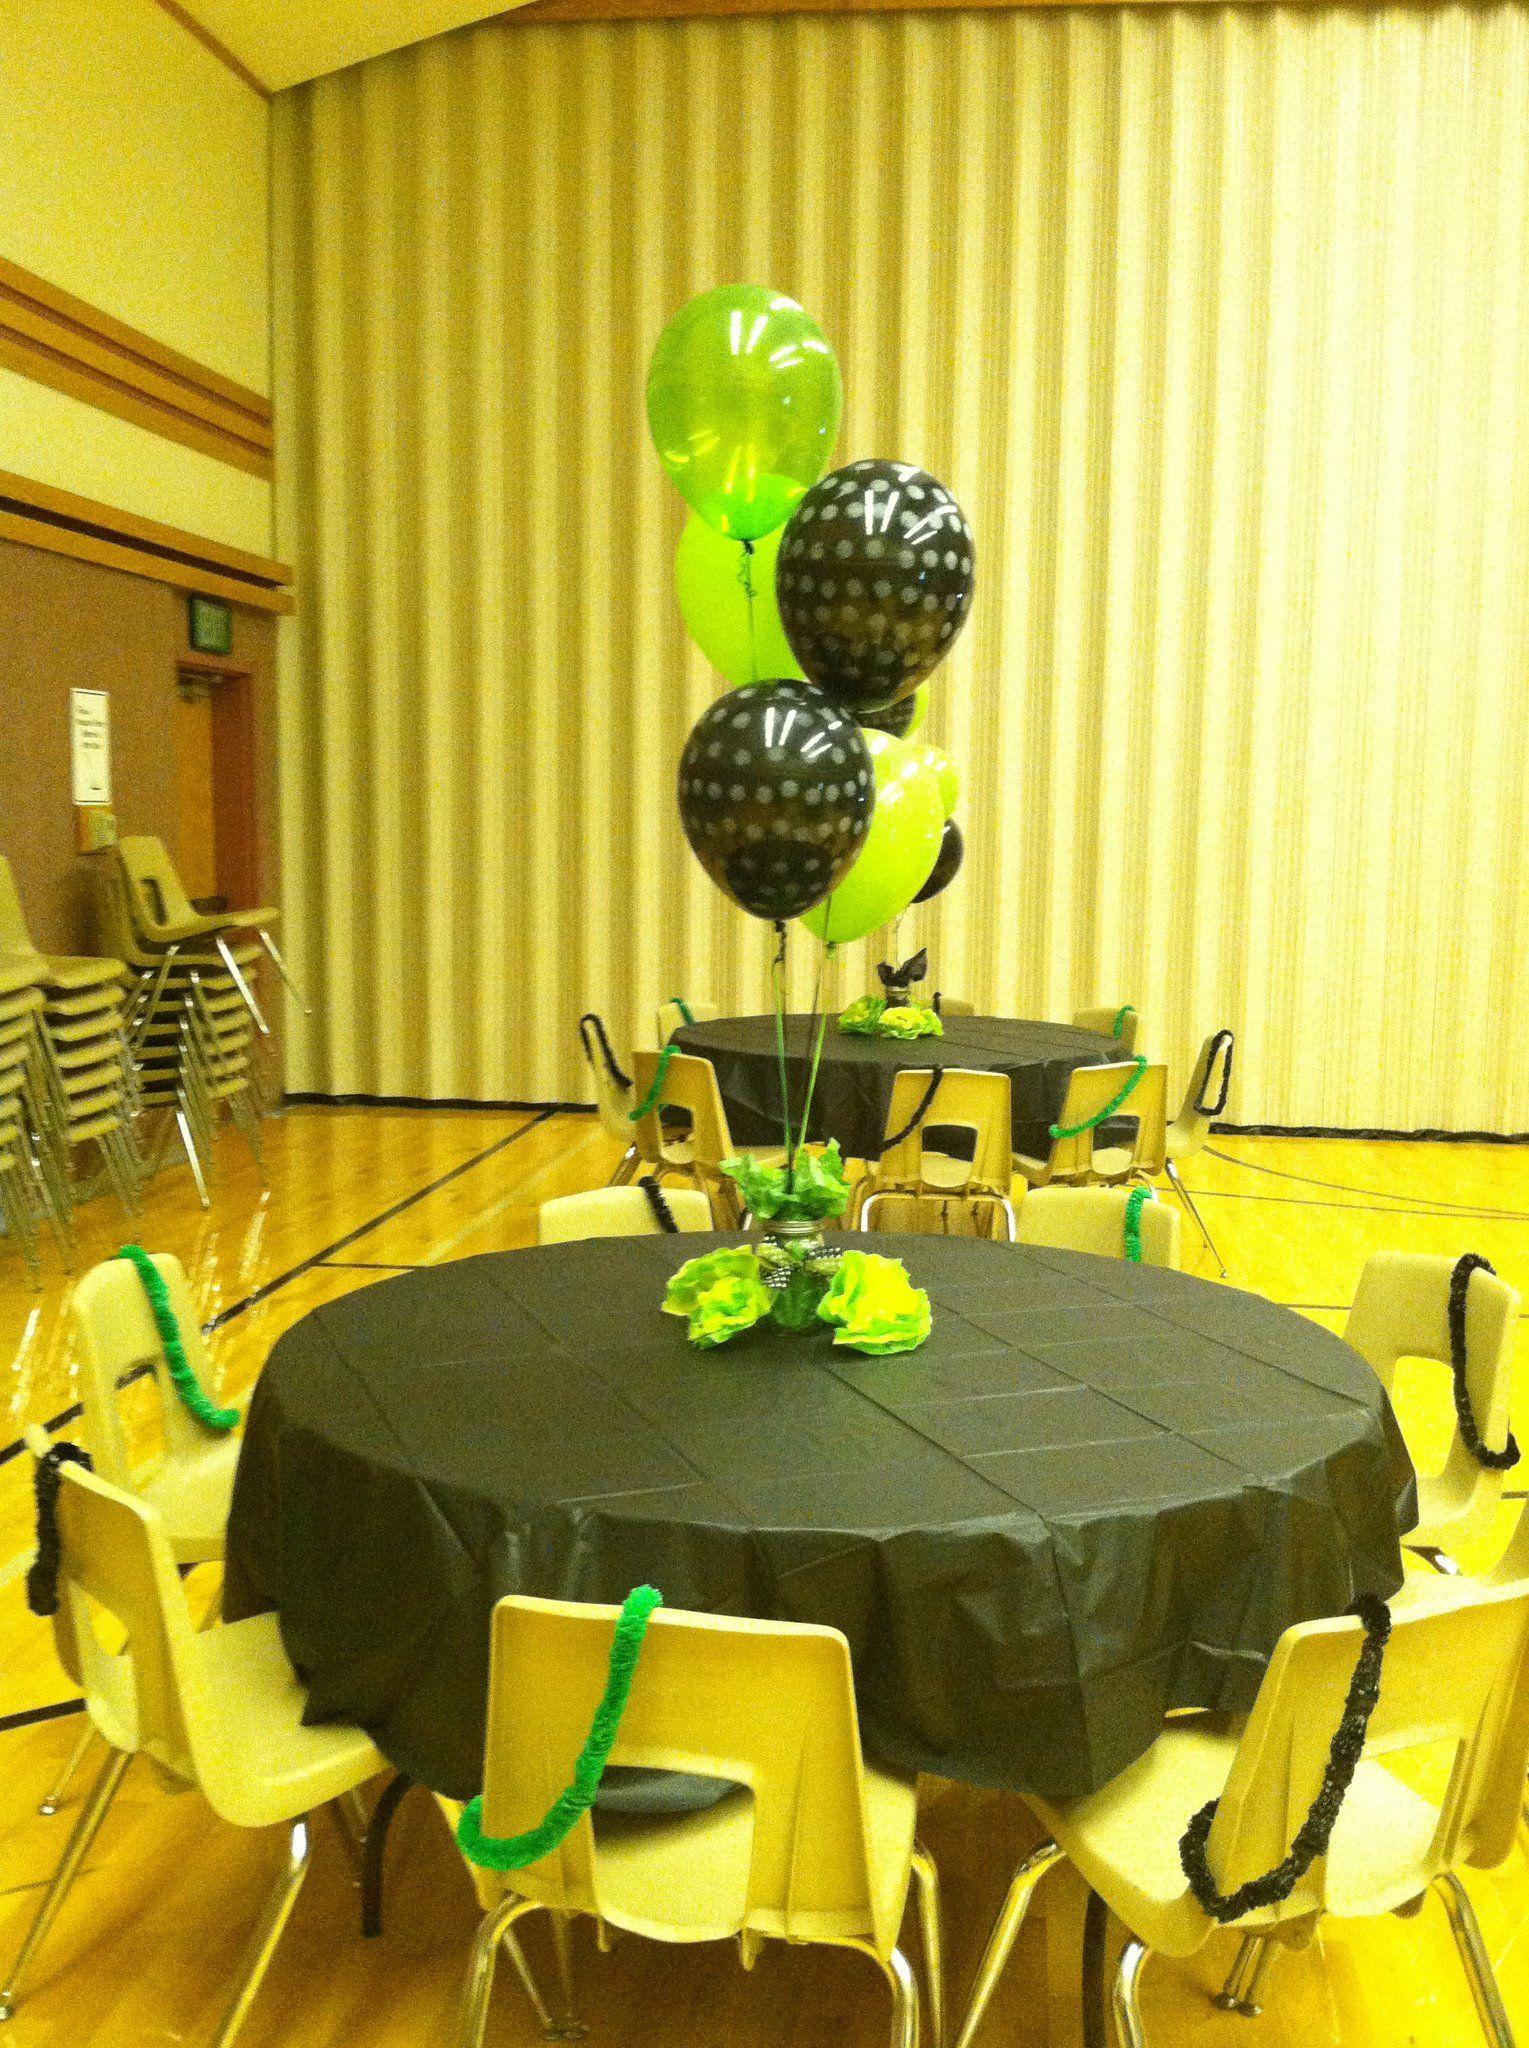 50th birthday party party ideas d pinterest for Table decor international marietta ga